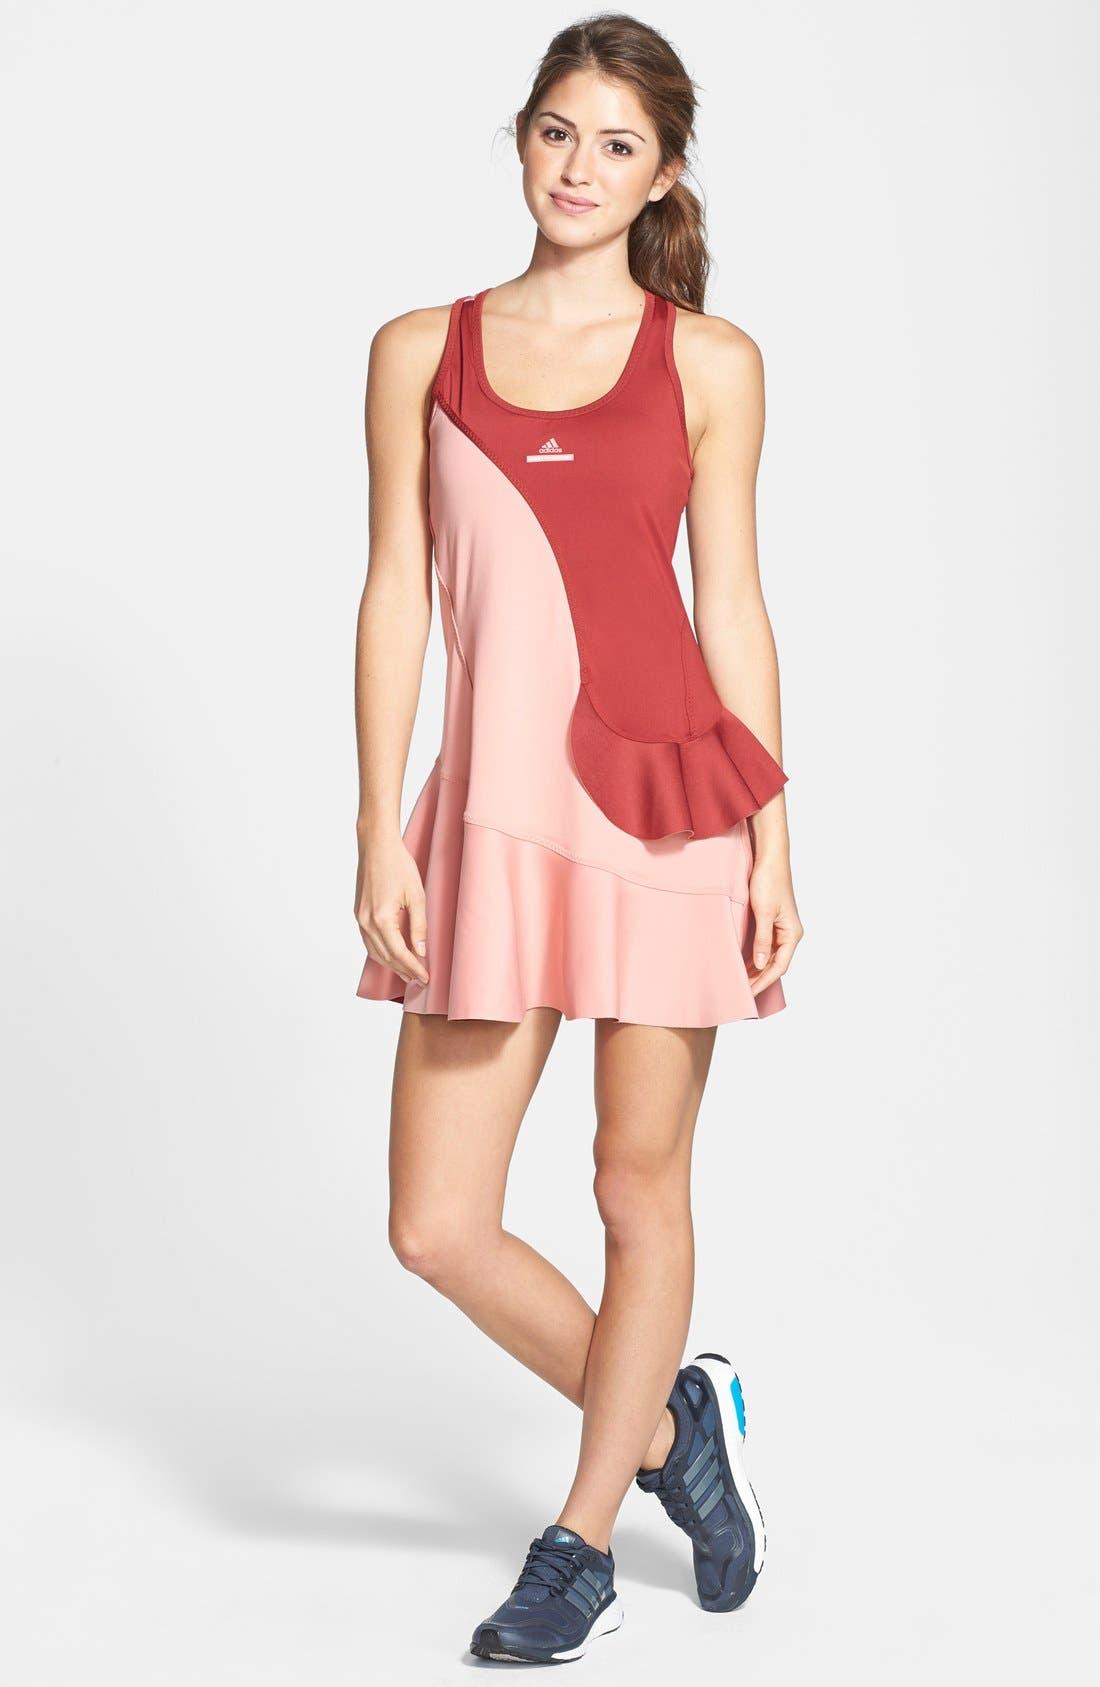 Alternate Image 1 Selected - adidas by Stella McCartney 'Barricade' Ruffled Dress